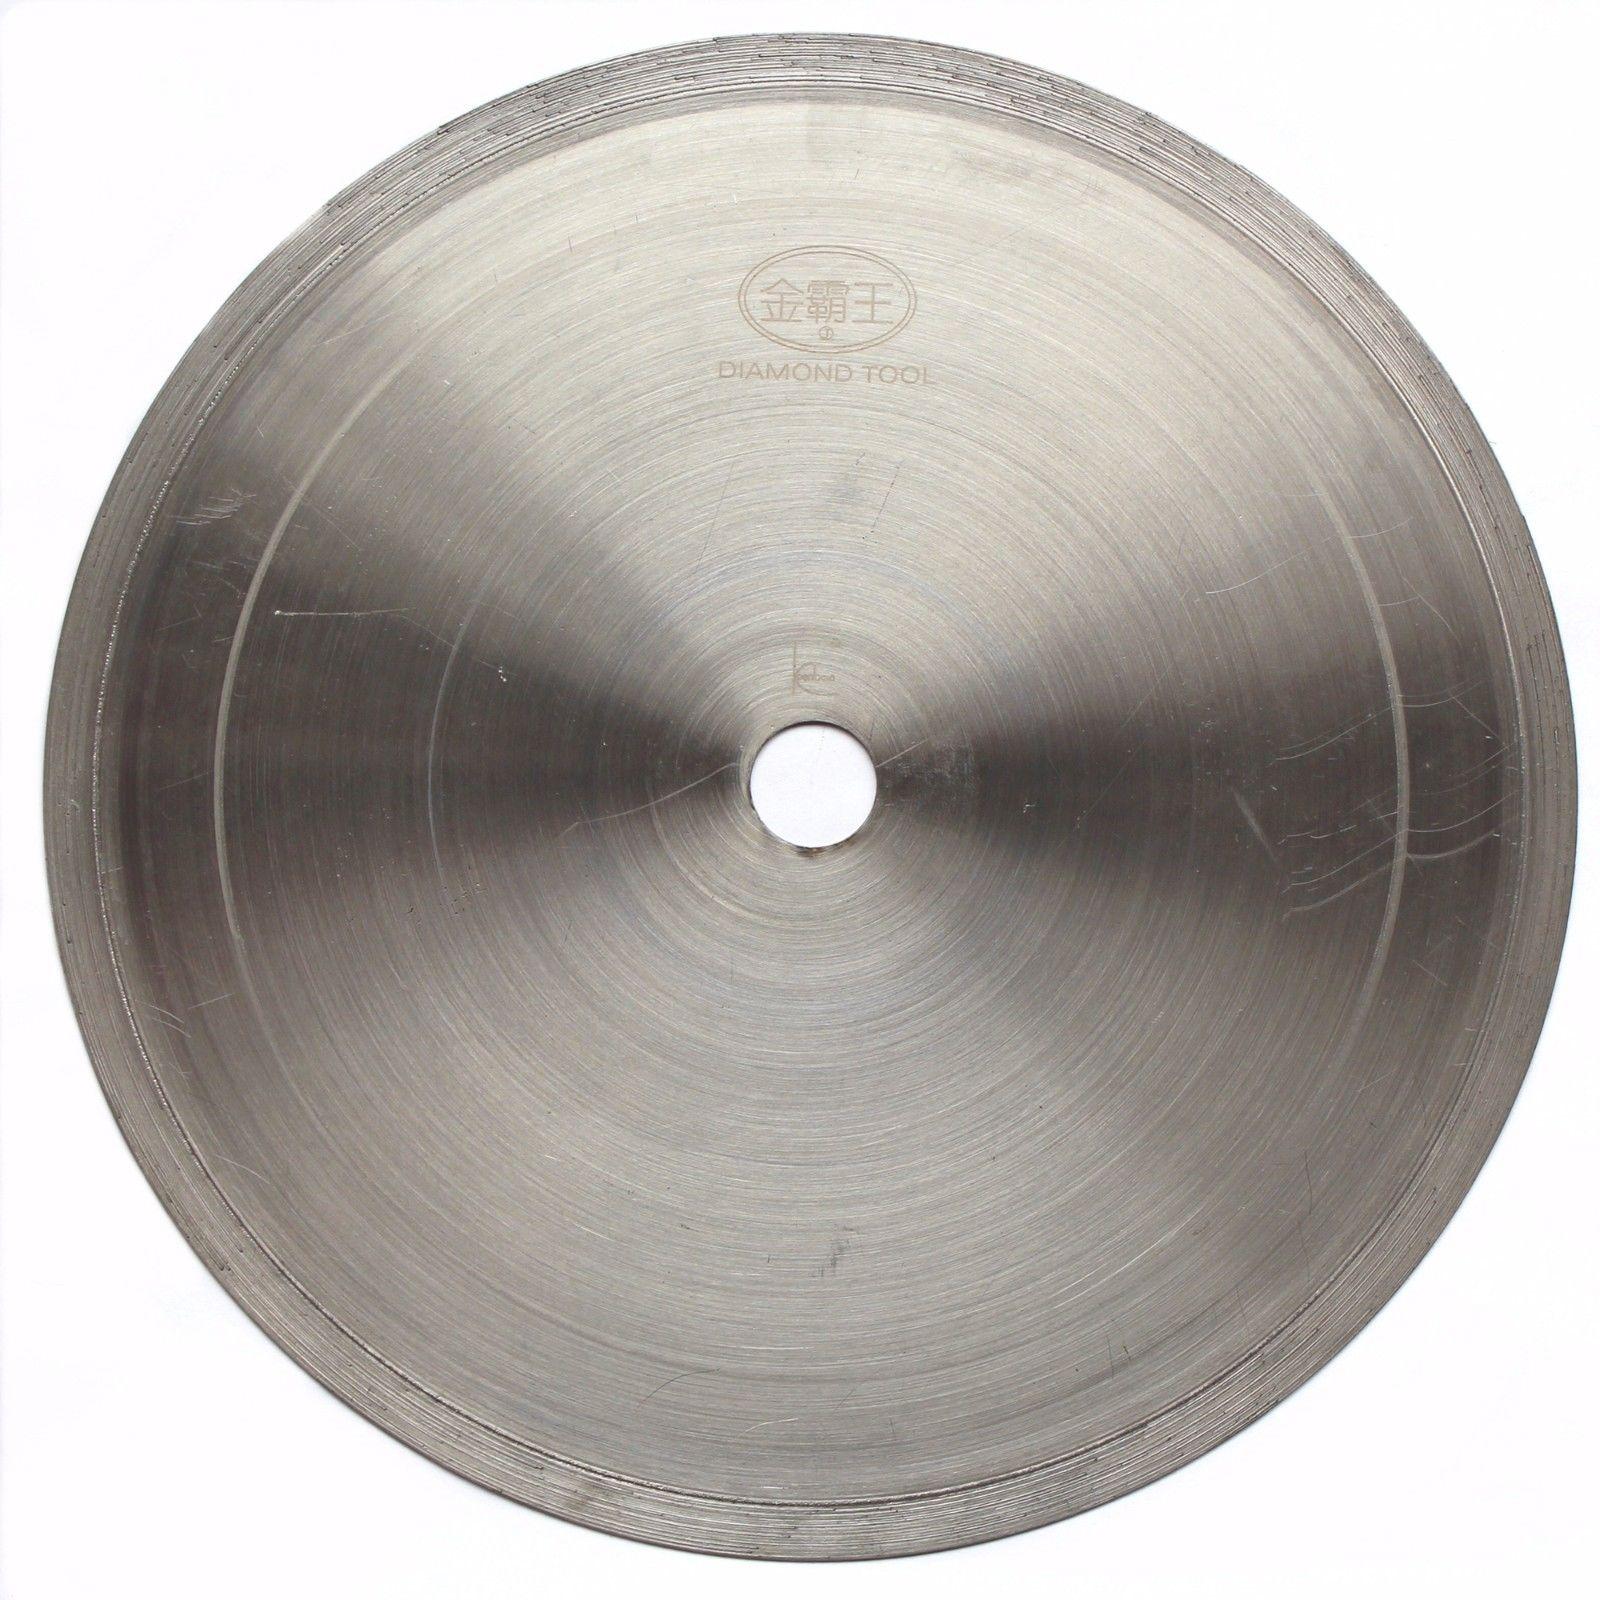 12 inch SINTERED Diamond Lapidary Saw Trim Cutting Blade Arbor 1-1/4 Gemstone 300*32 ILOVETOOL 6 inch lapidary concave arc diamond coated grinding wheel grind spherical 6 mm ilovetool